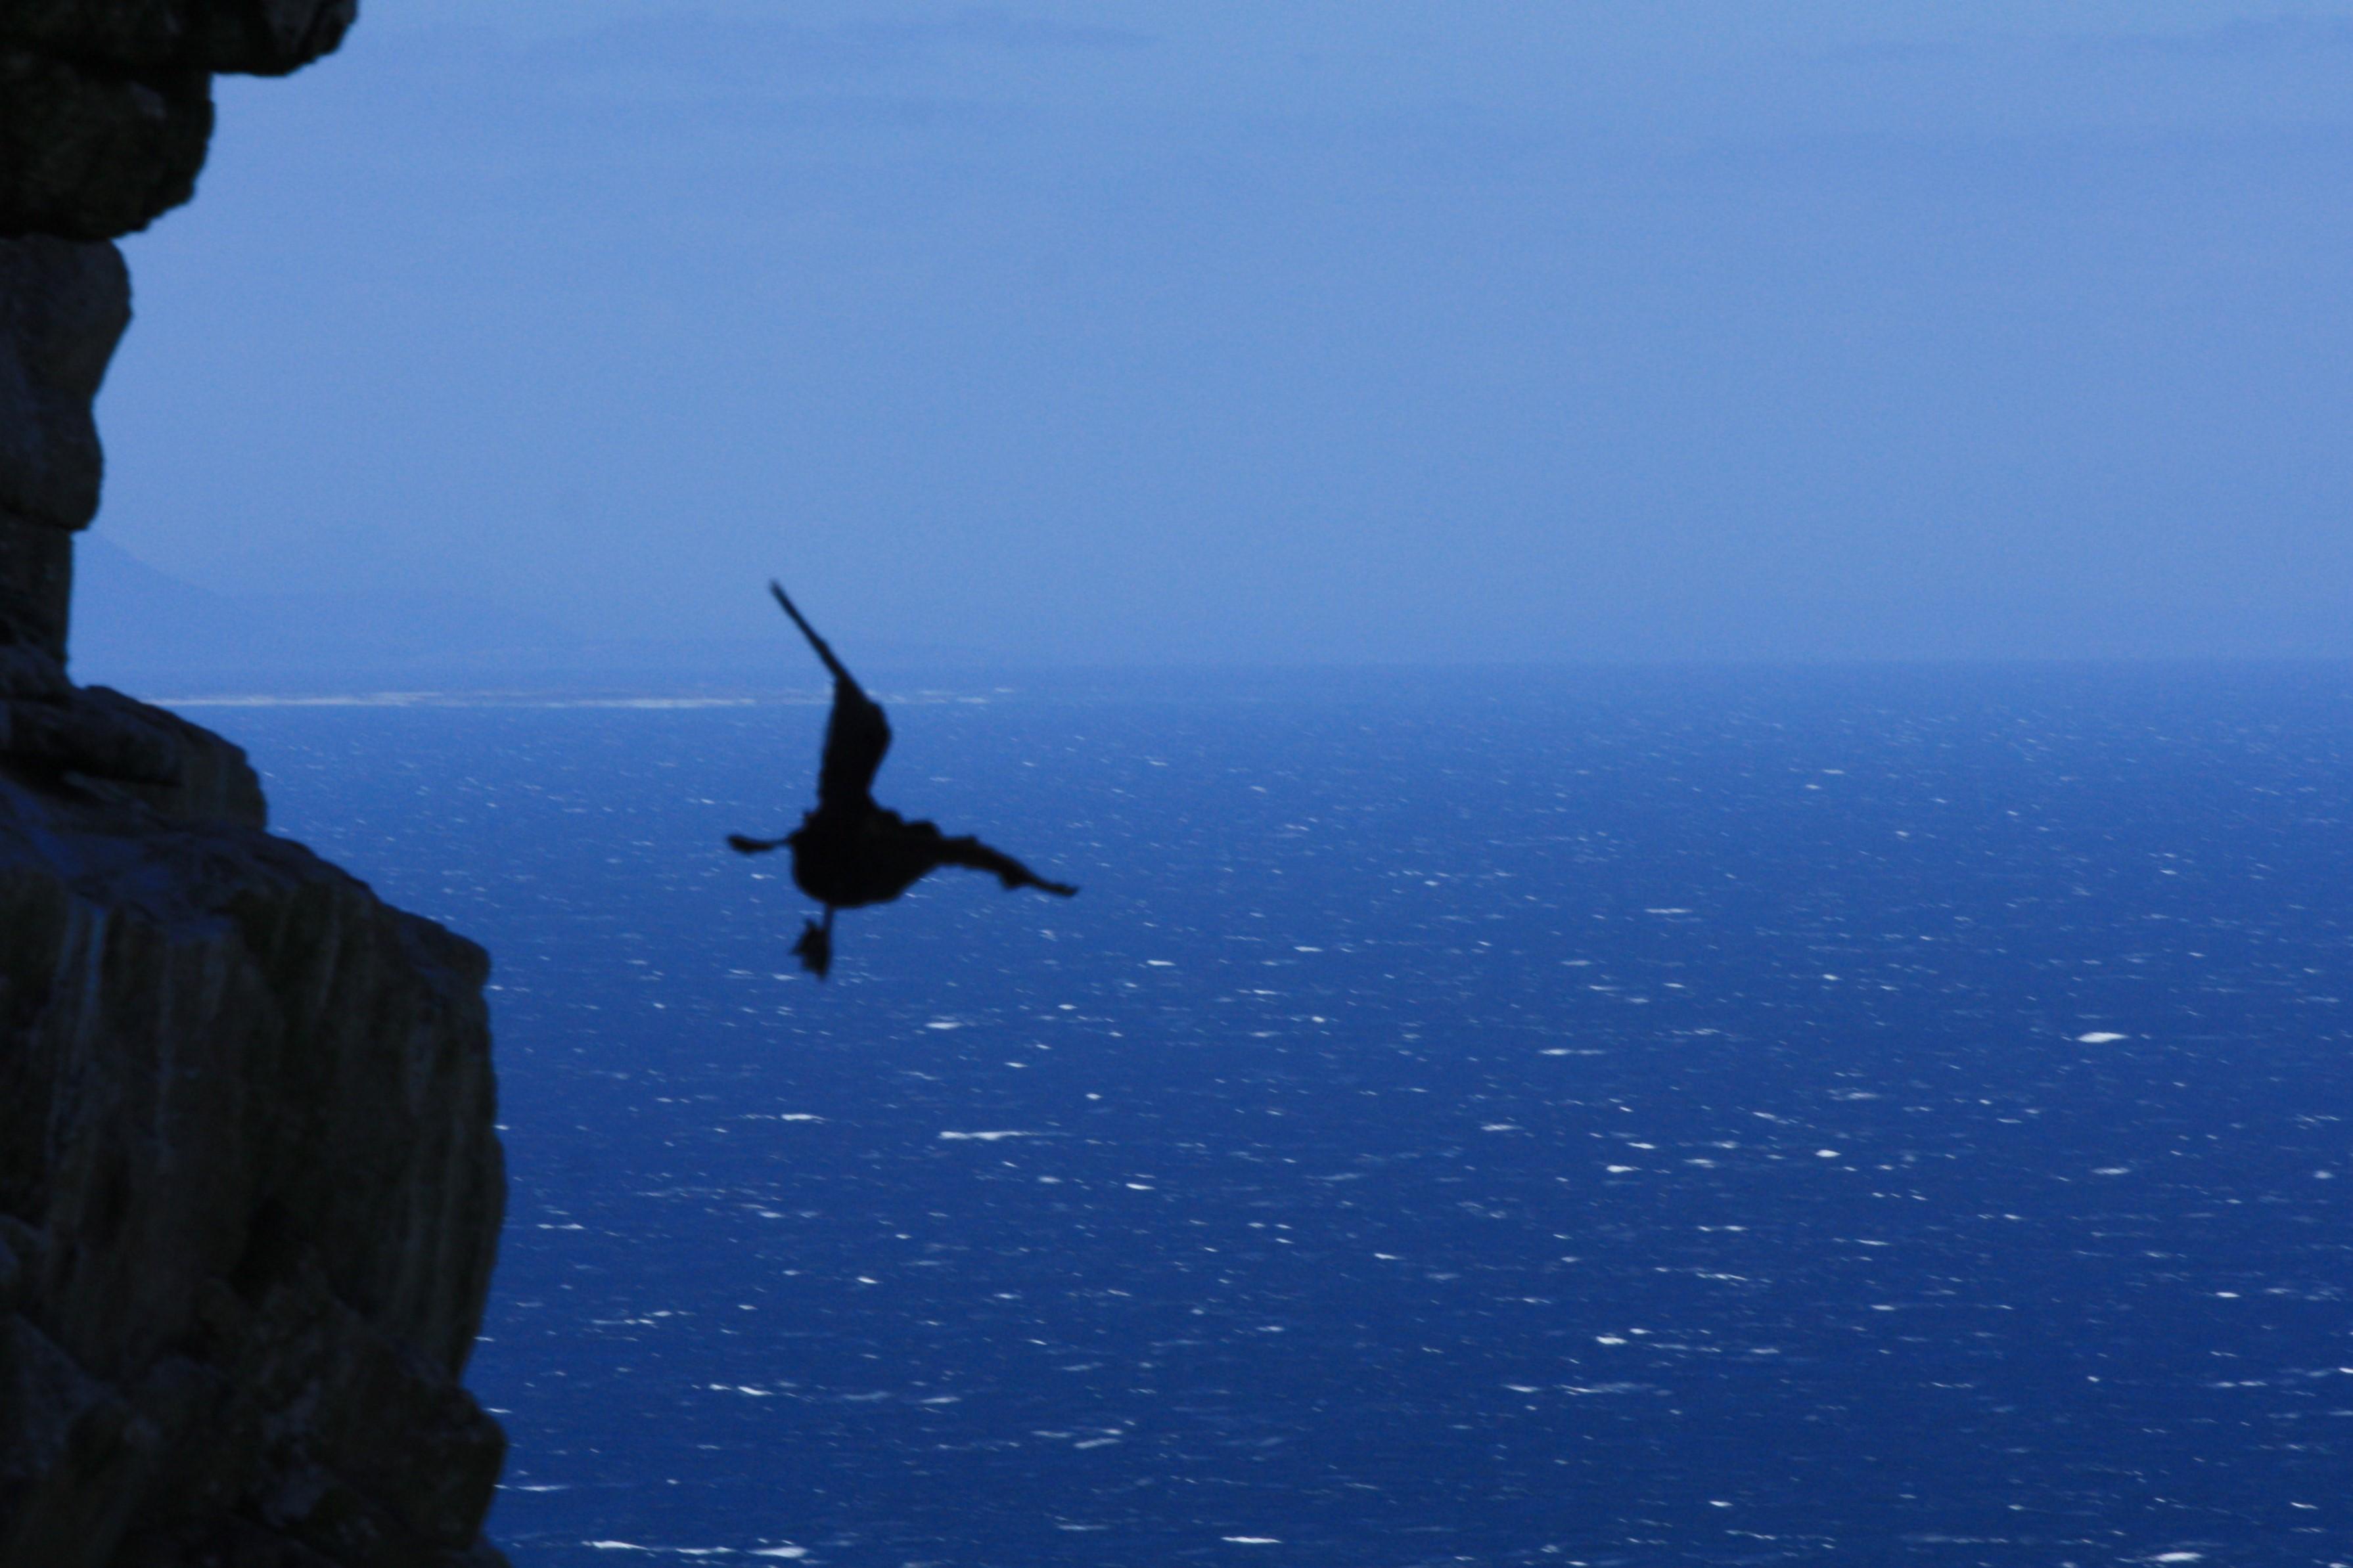 Stuntvliegen